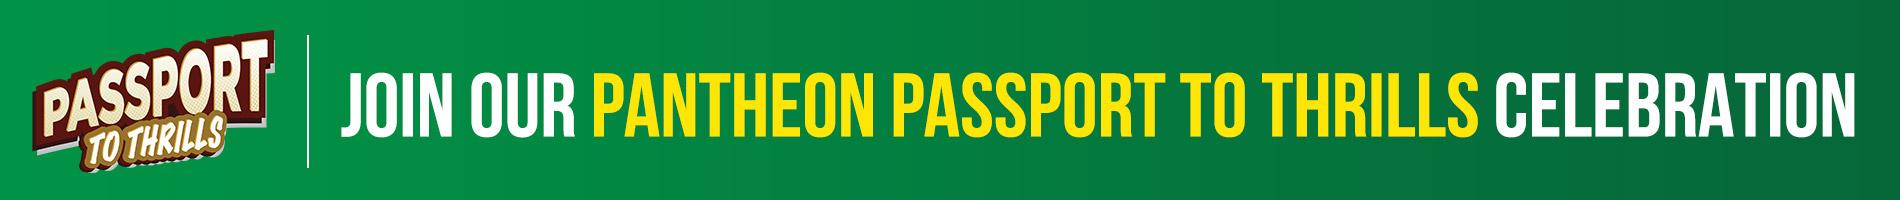 Join our Pantheon Passport to Thrills Celebration